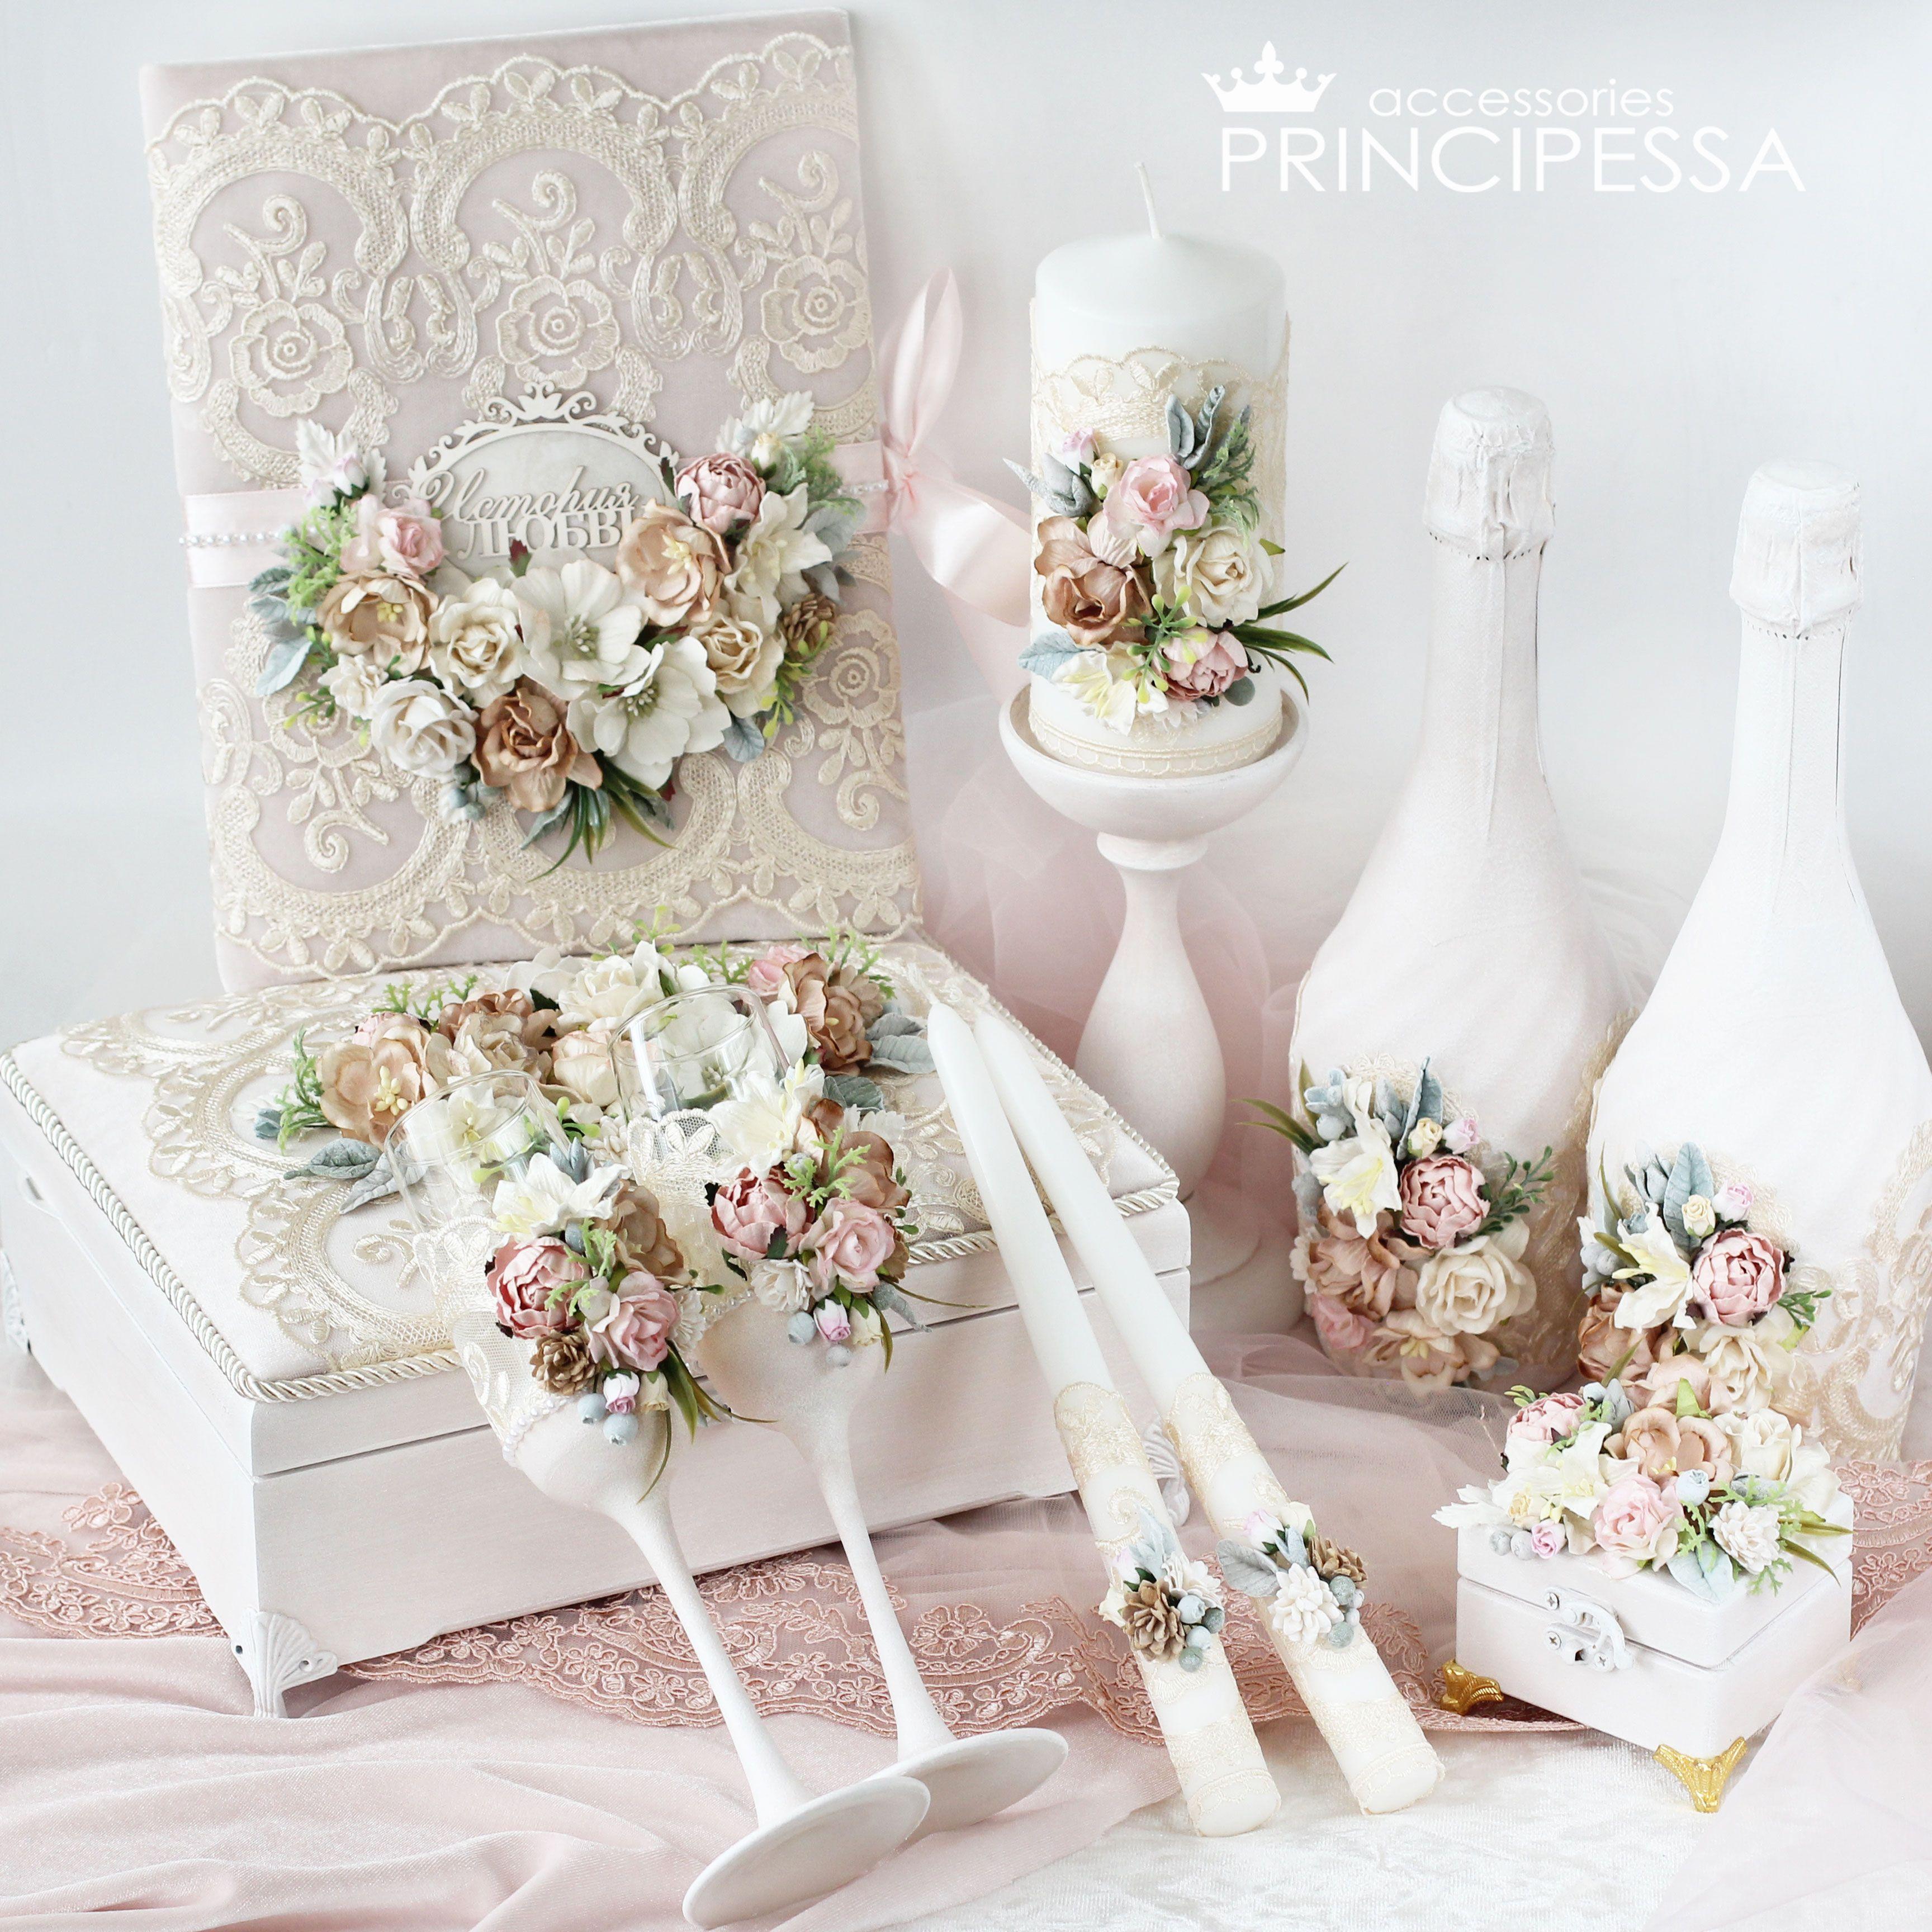 Wedding Decor Bridal Accessories Wedding Accessories Svadebnye Aksessuary Cvety Ruchnoj Rabot Diy Wedding Decorations Custom Wedding Candles Wedding Bottles